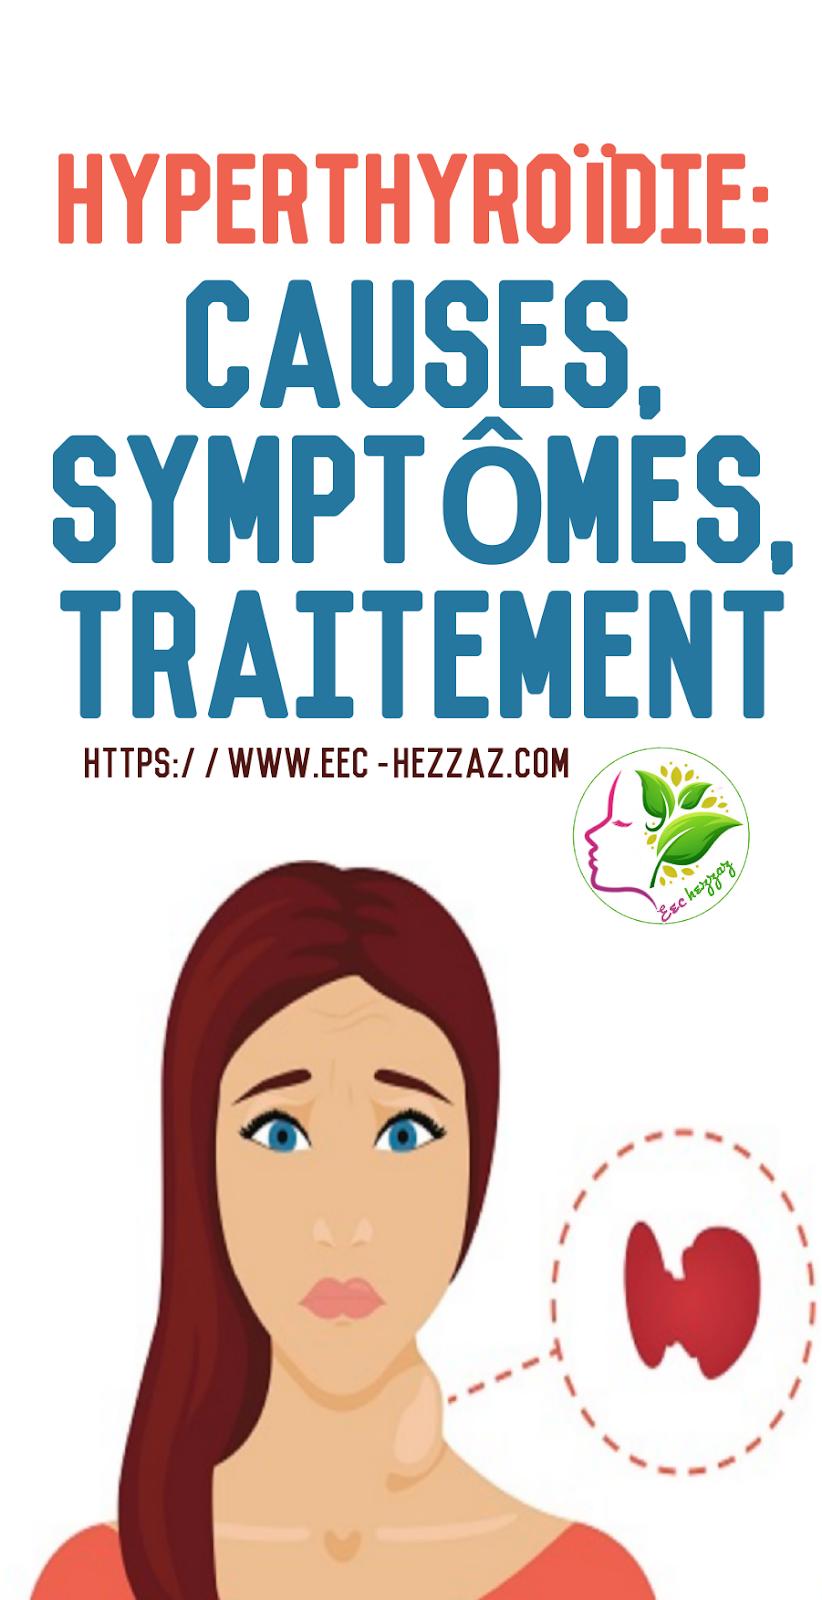 Hyperthyroïdie: causes, symptômes, traitement